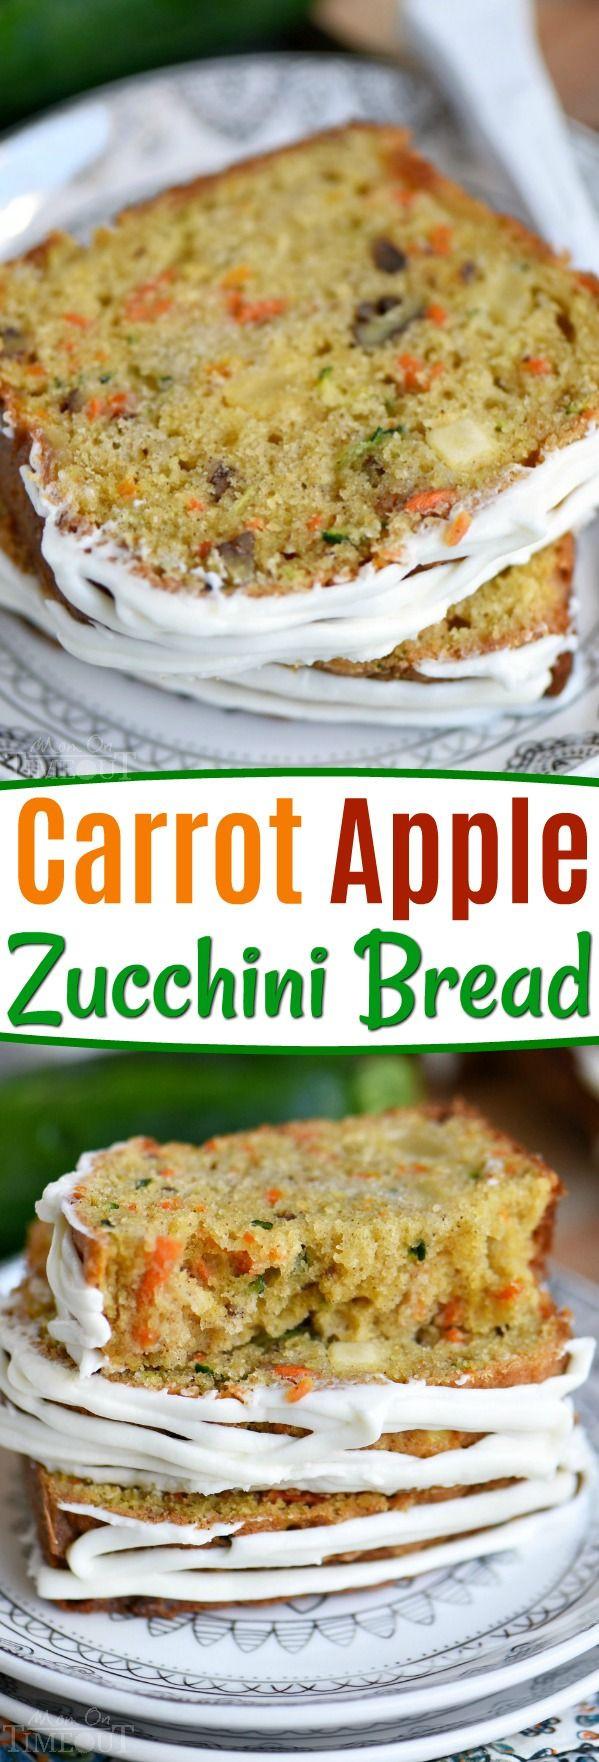 Carrot Apple Zucchini Bread  Carrot Apple Zucchini Bread – This Carrot Apple Zucchini